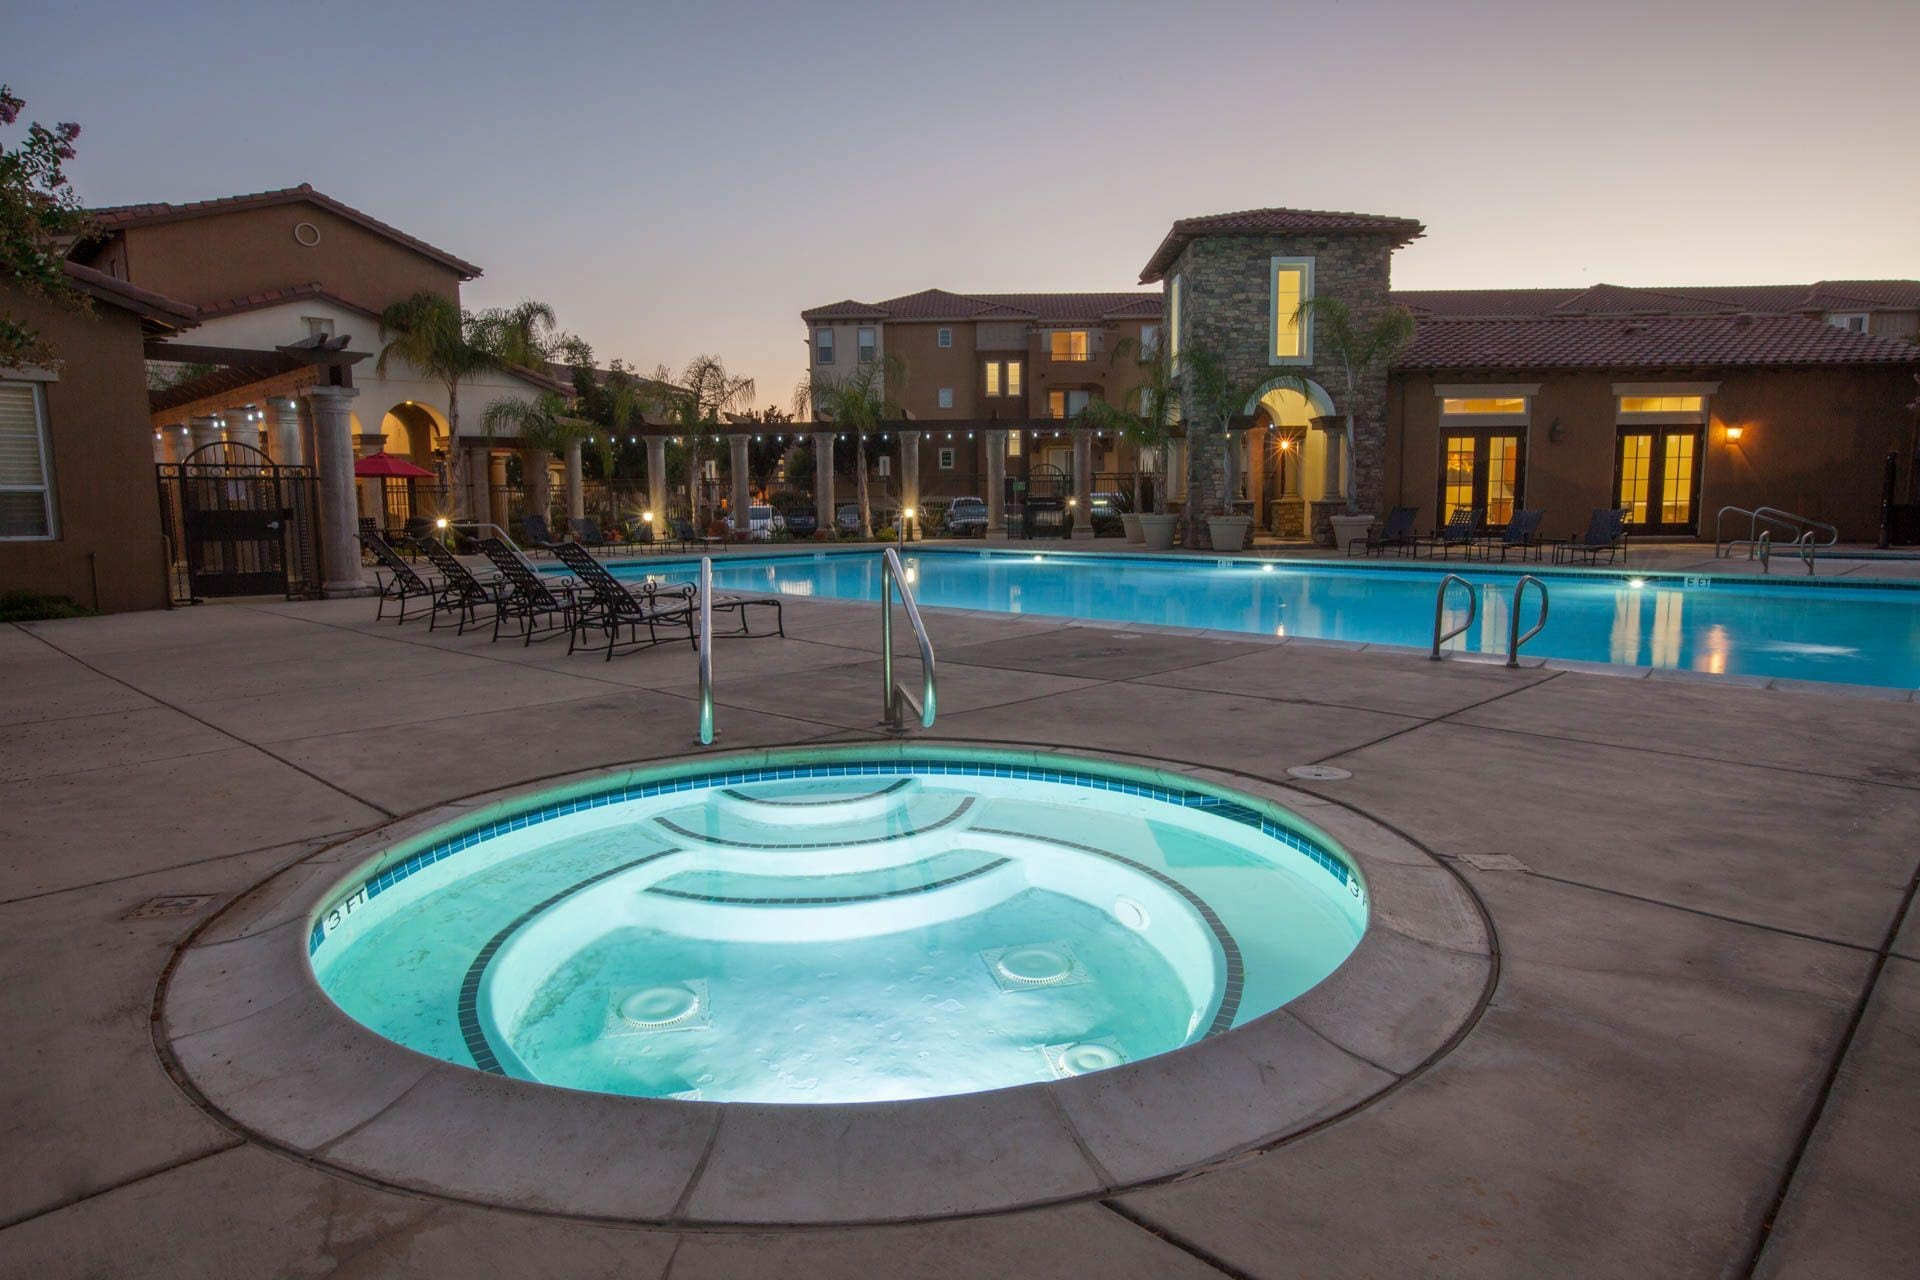 Bella Villagio - San Jose, CA Apartments for rent